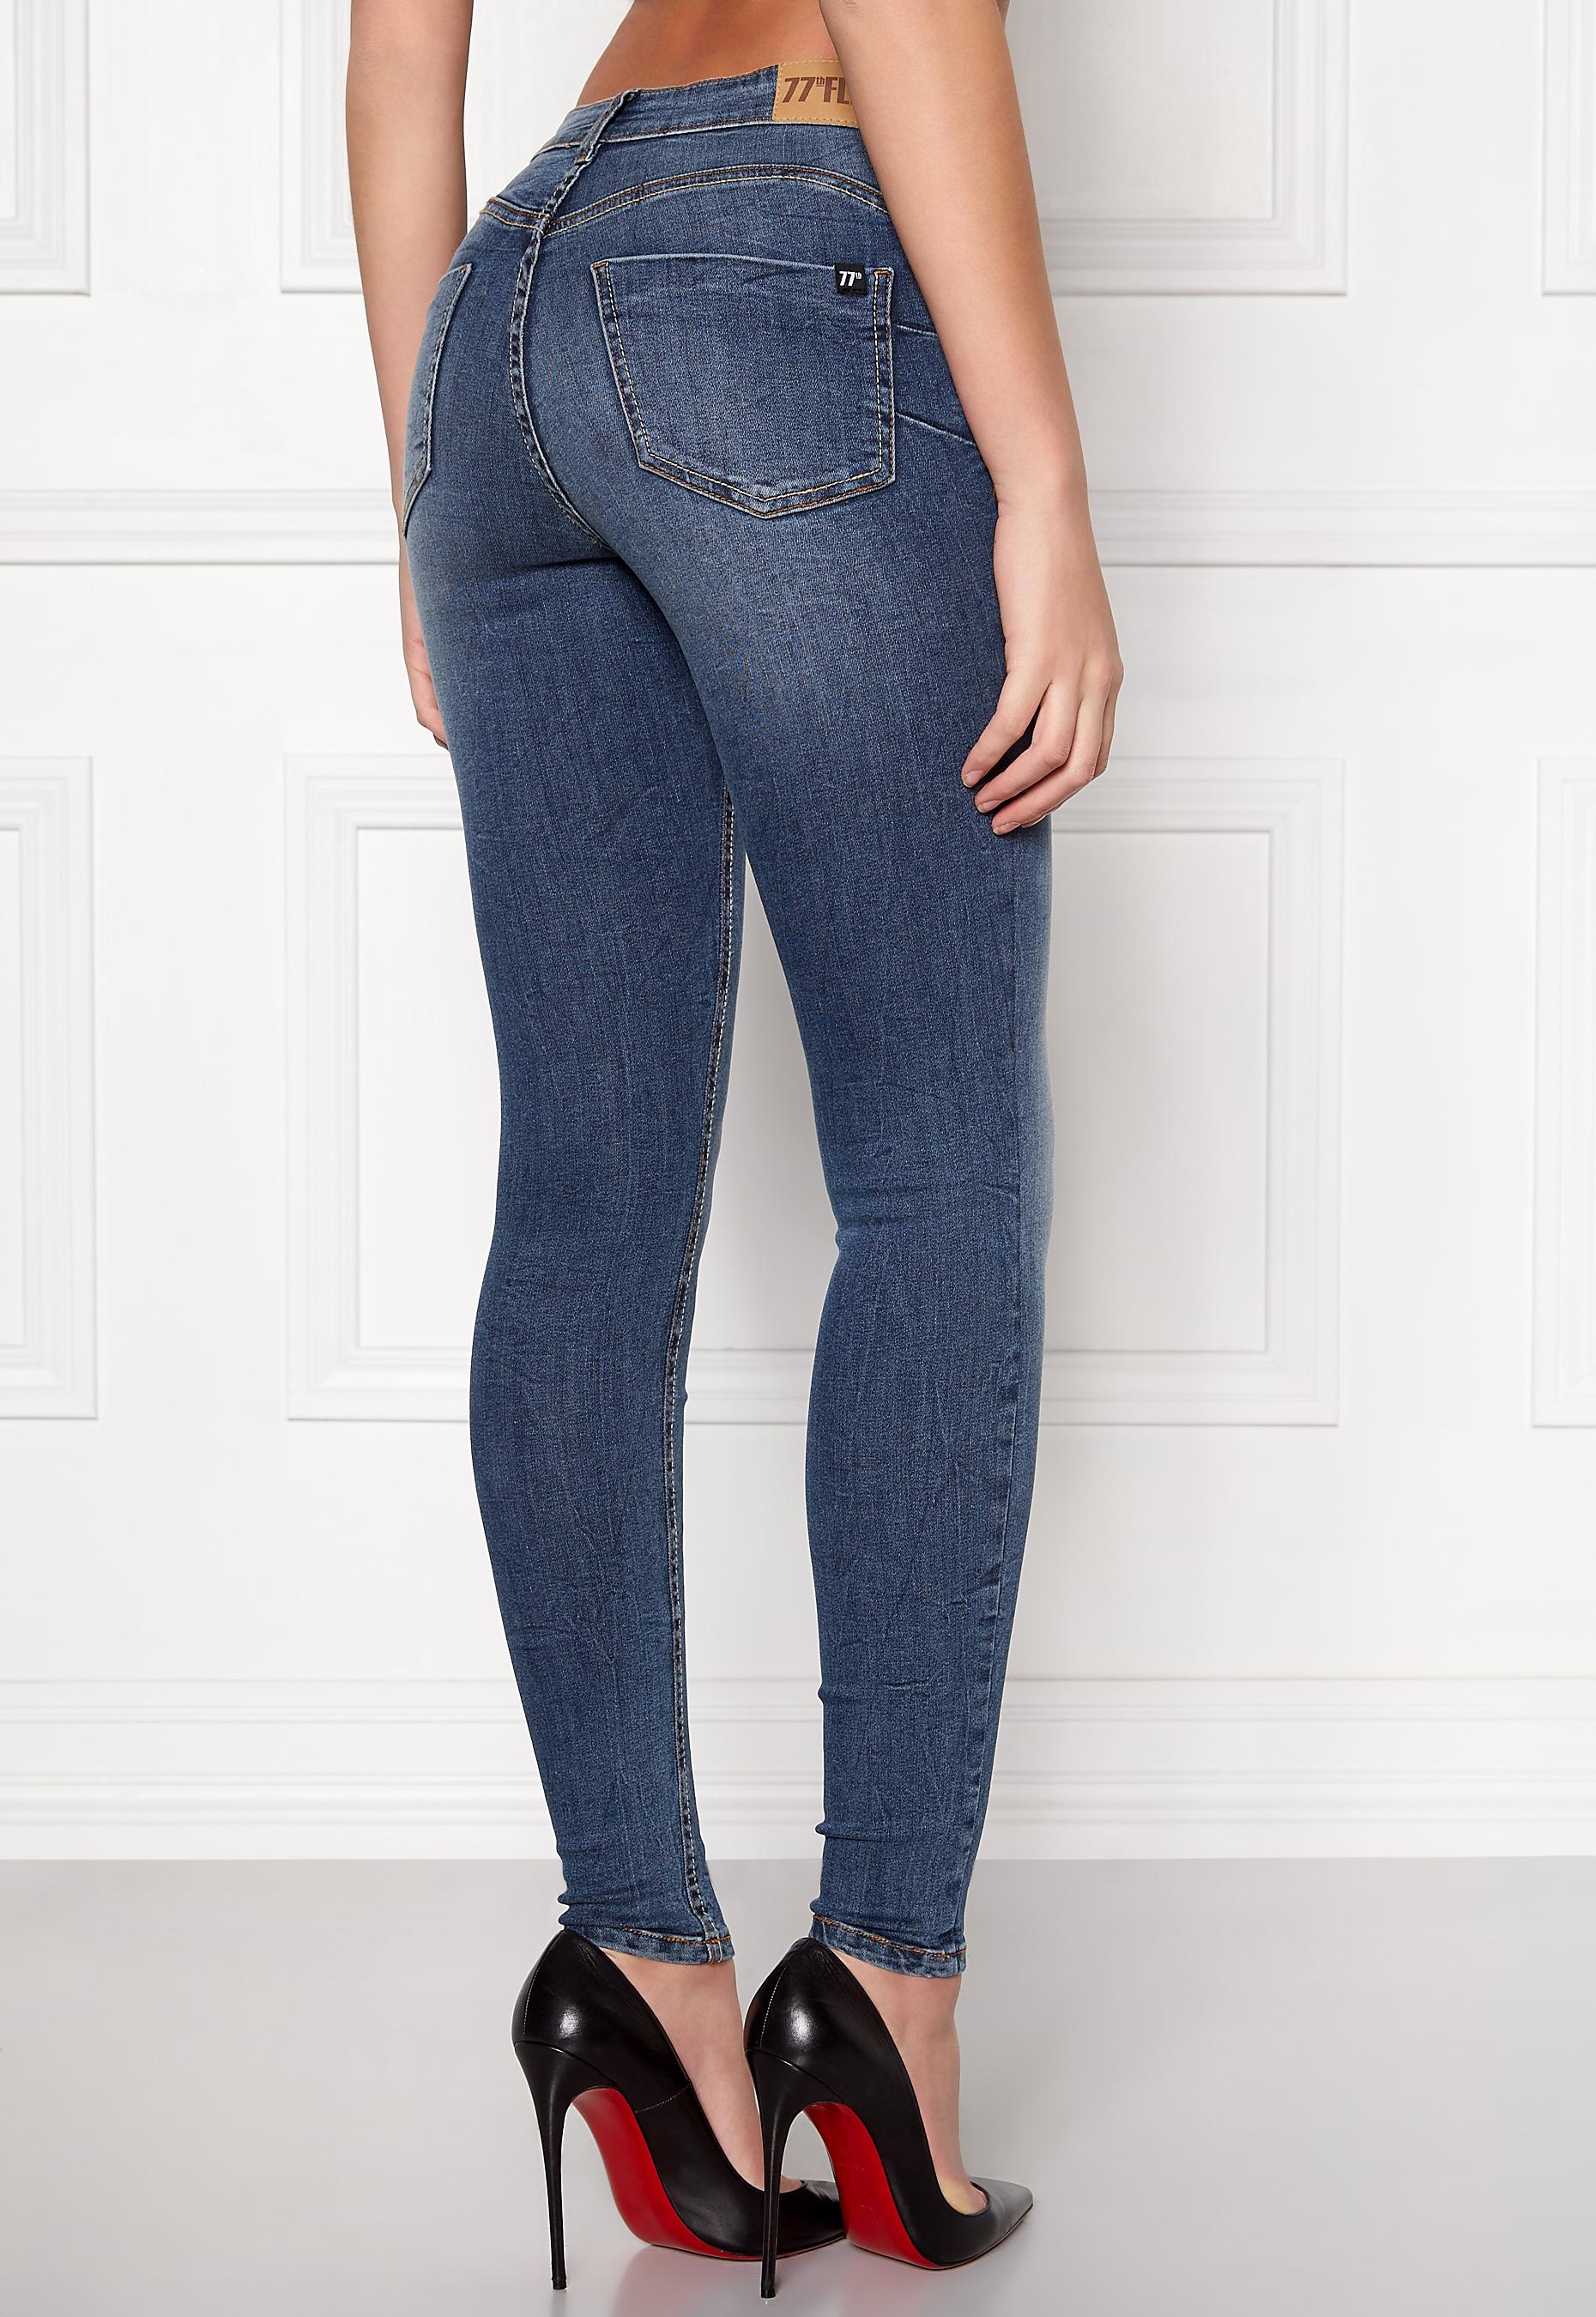 86313650 77thFLEA Miranda Push-up jeans Medium blue - Bubbleroom